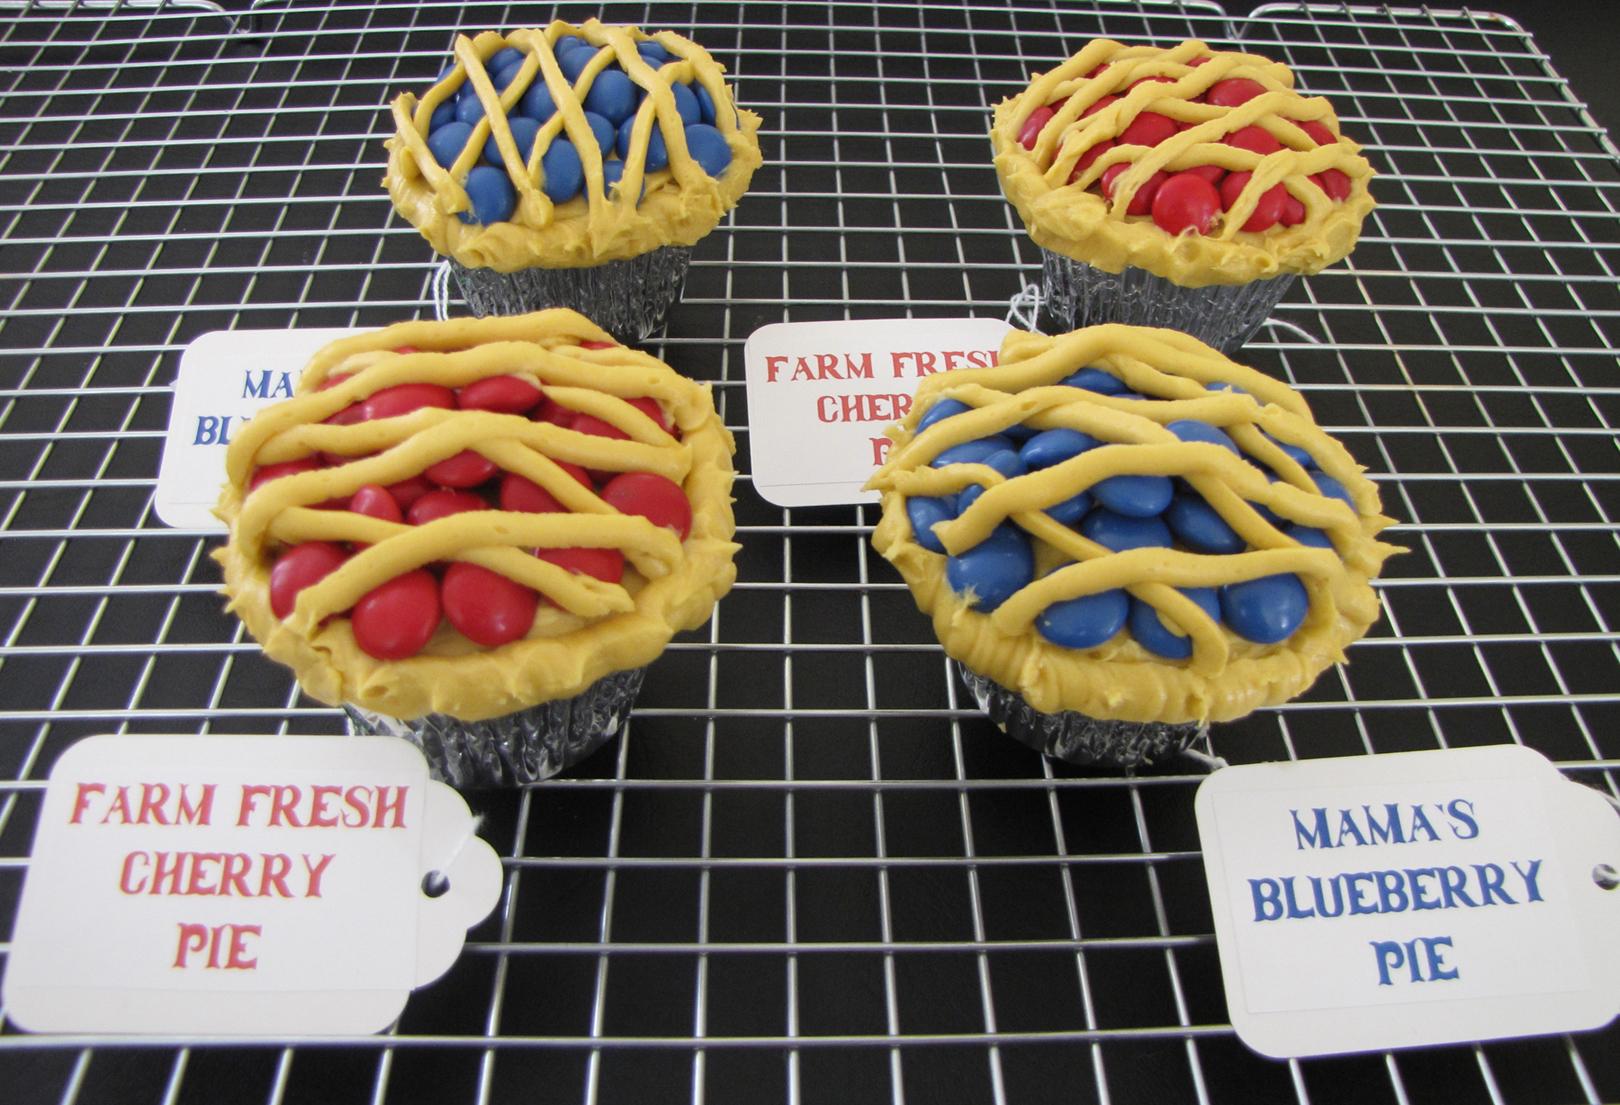 County Fair Pie Cupcakes